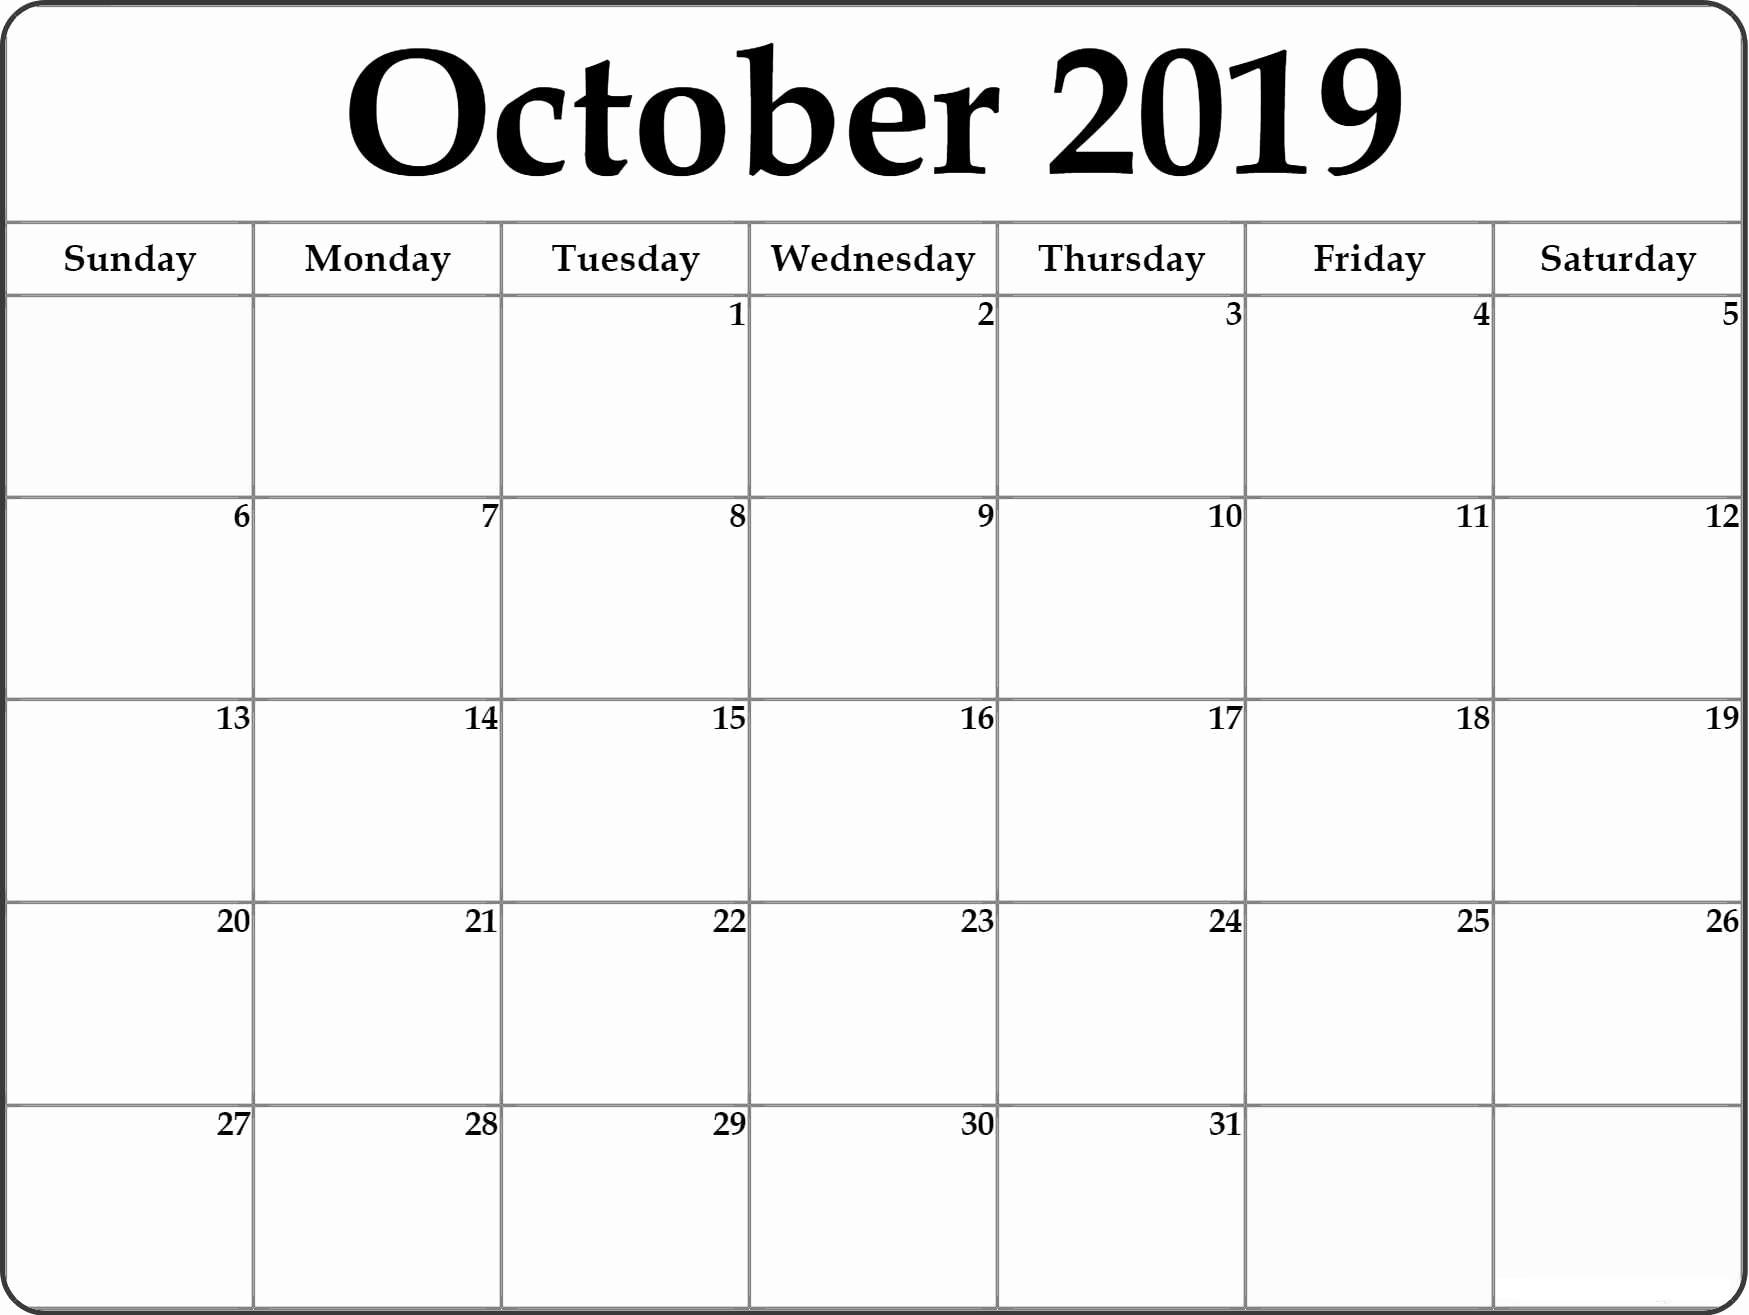 Monthly October 2019 Calendar